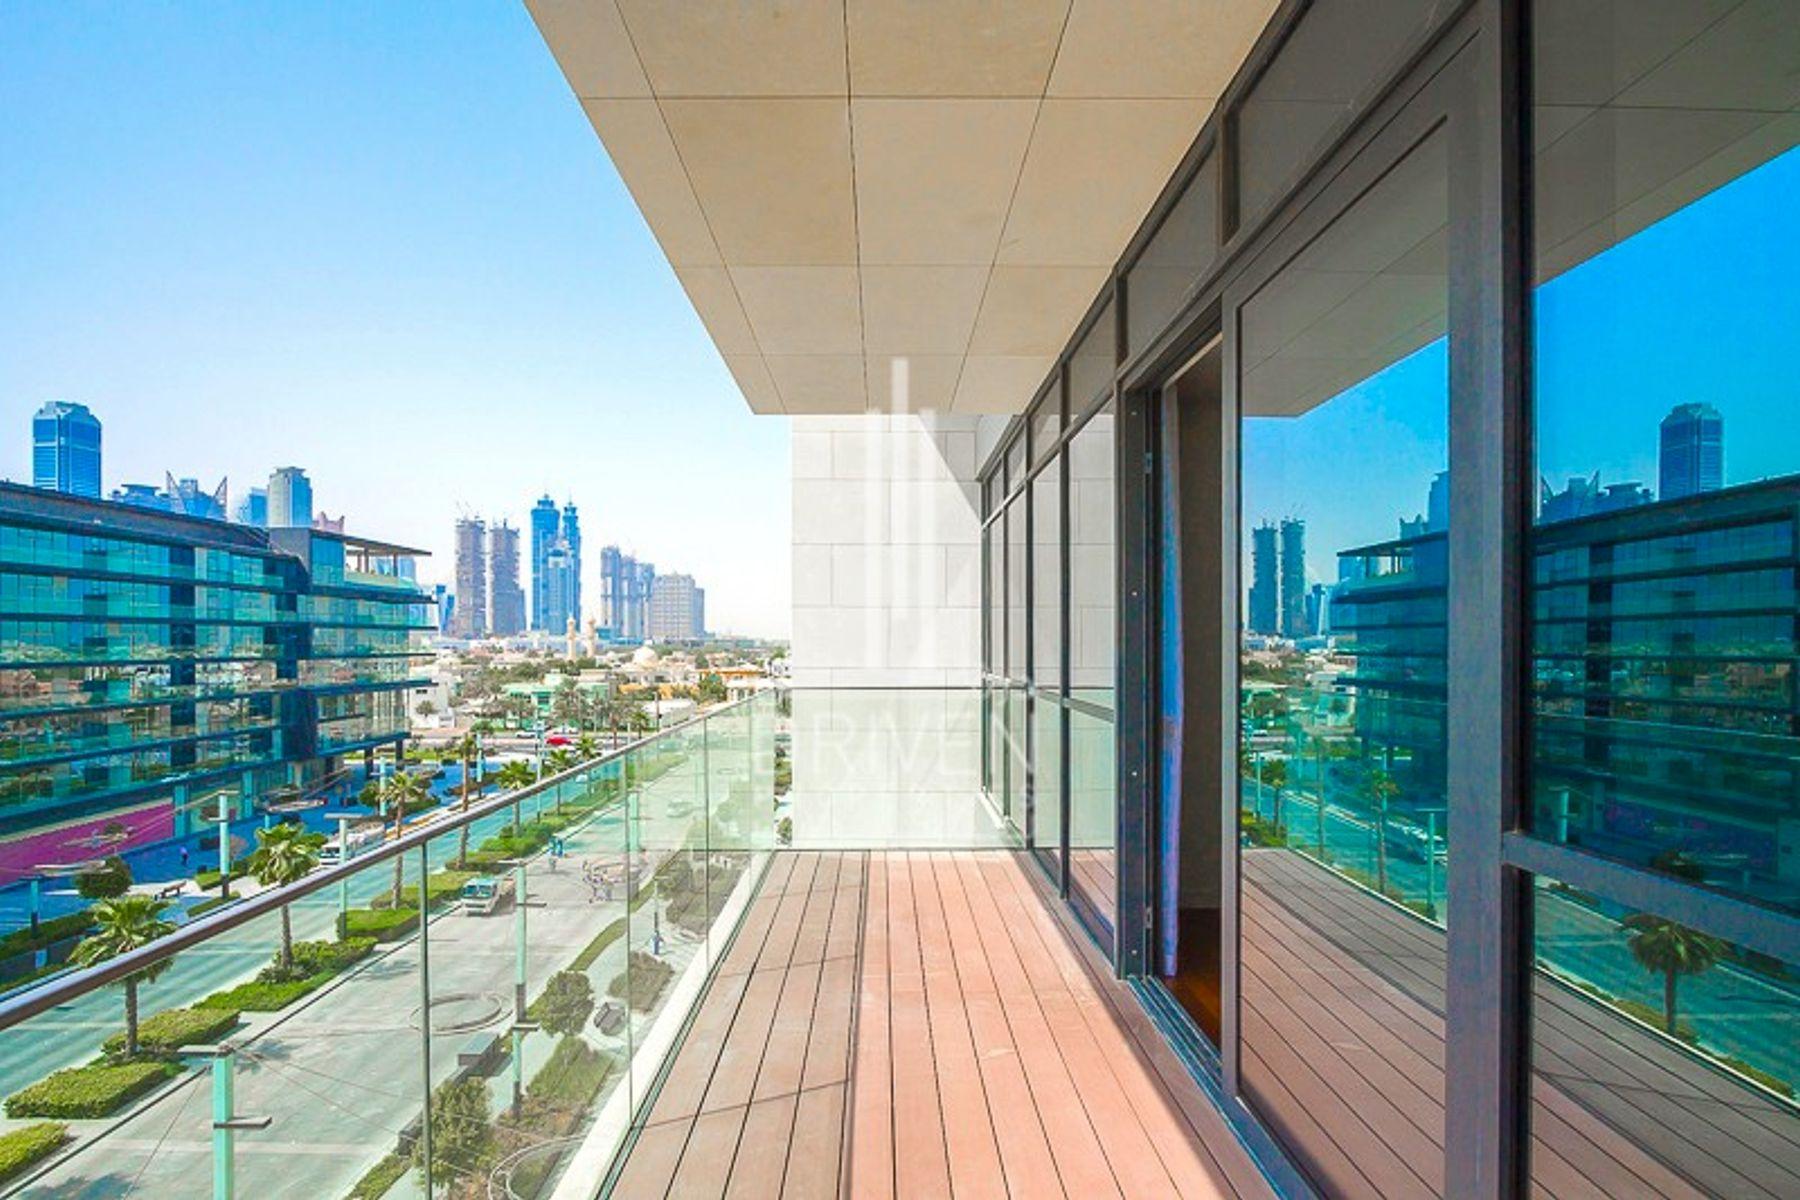 The Best Views: Boulevard and Burj Khalifa